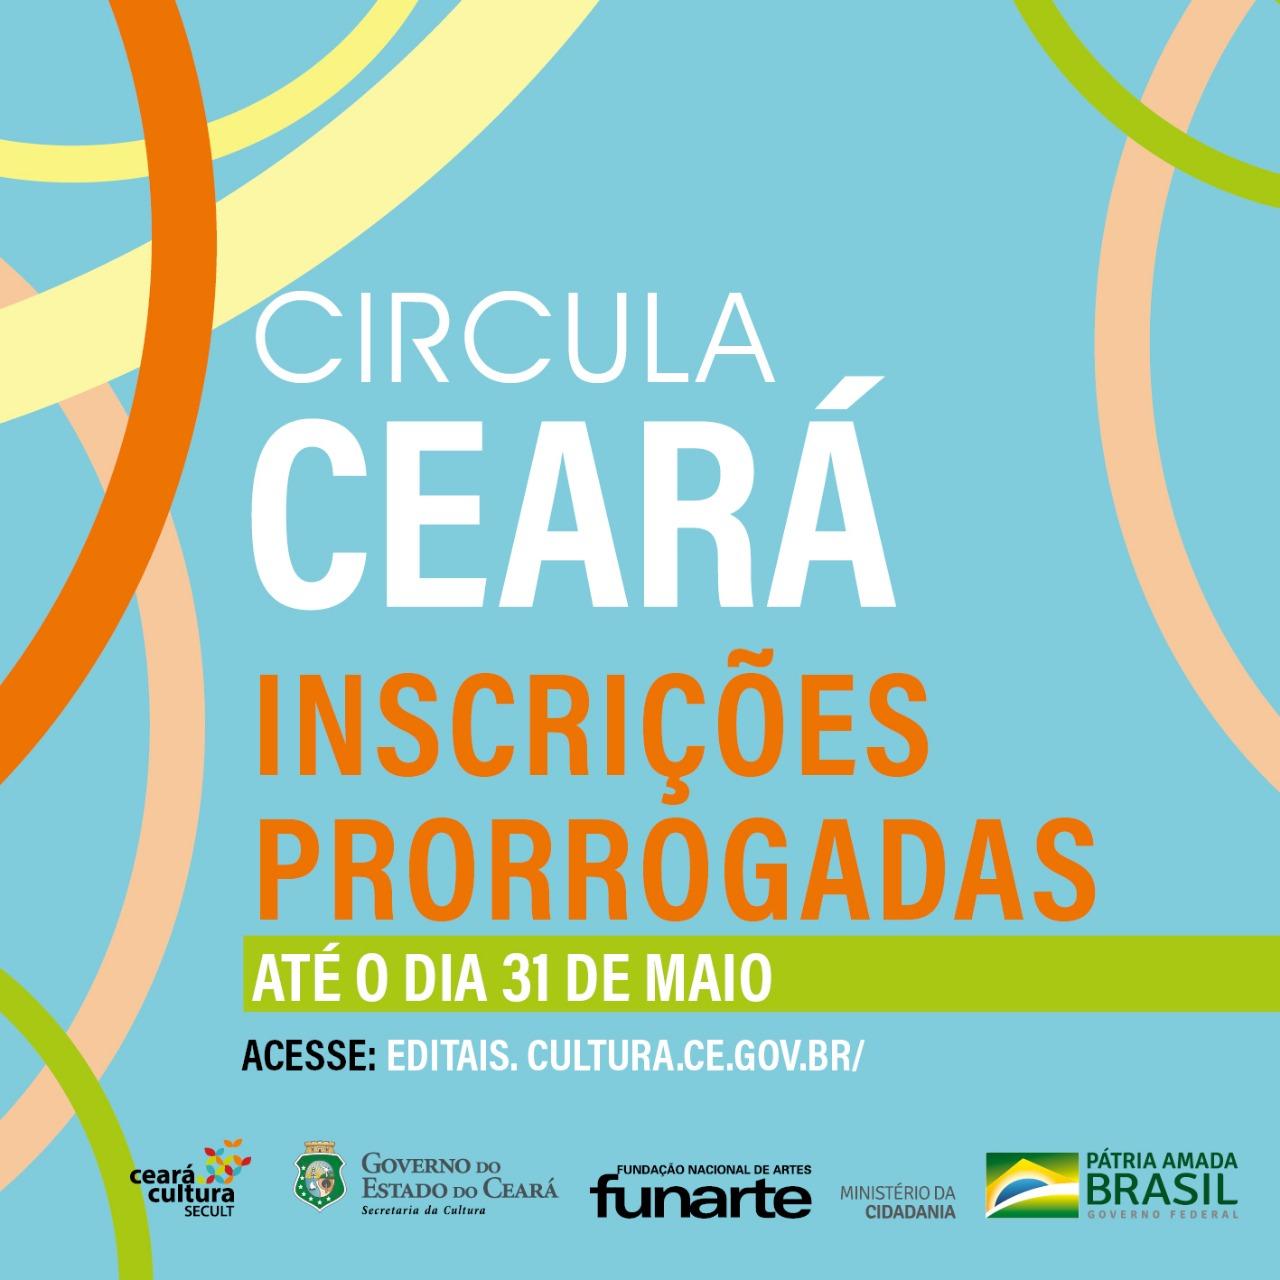 Inscrições prorrogadas Circula Ceará